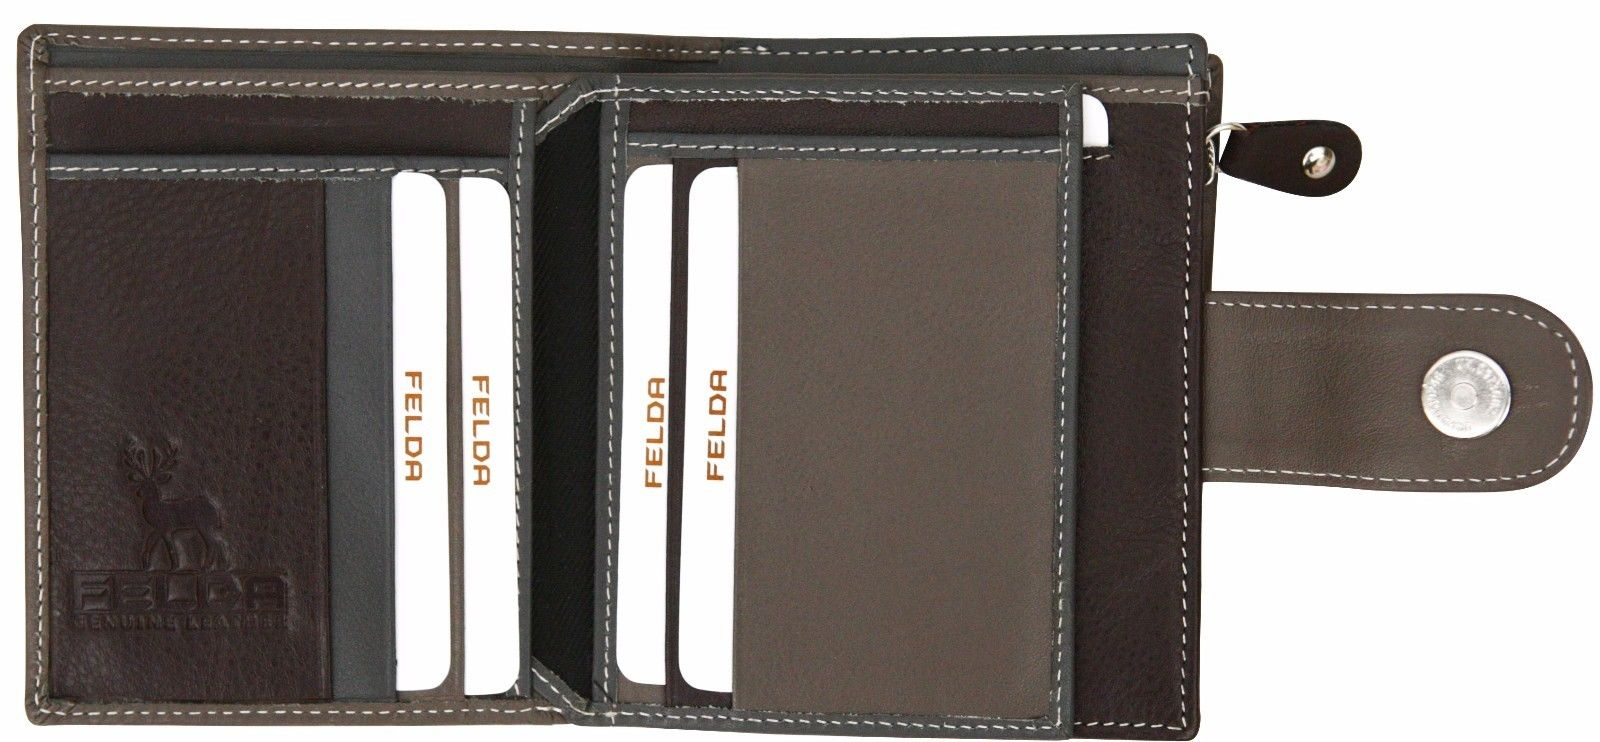 Felda-RFID-onorevoli-MEDAGLIA-amp-Card-Purse-Wallet-Genuine-Leather-Multi-SOFT-BOX-REGALO miniatura 57